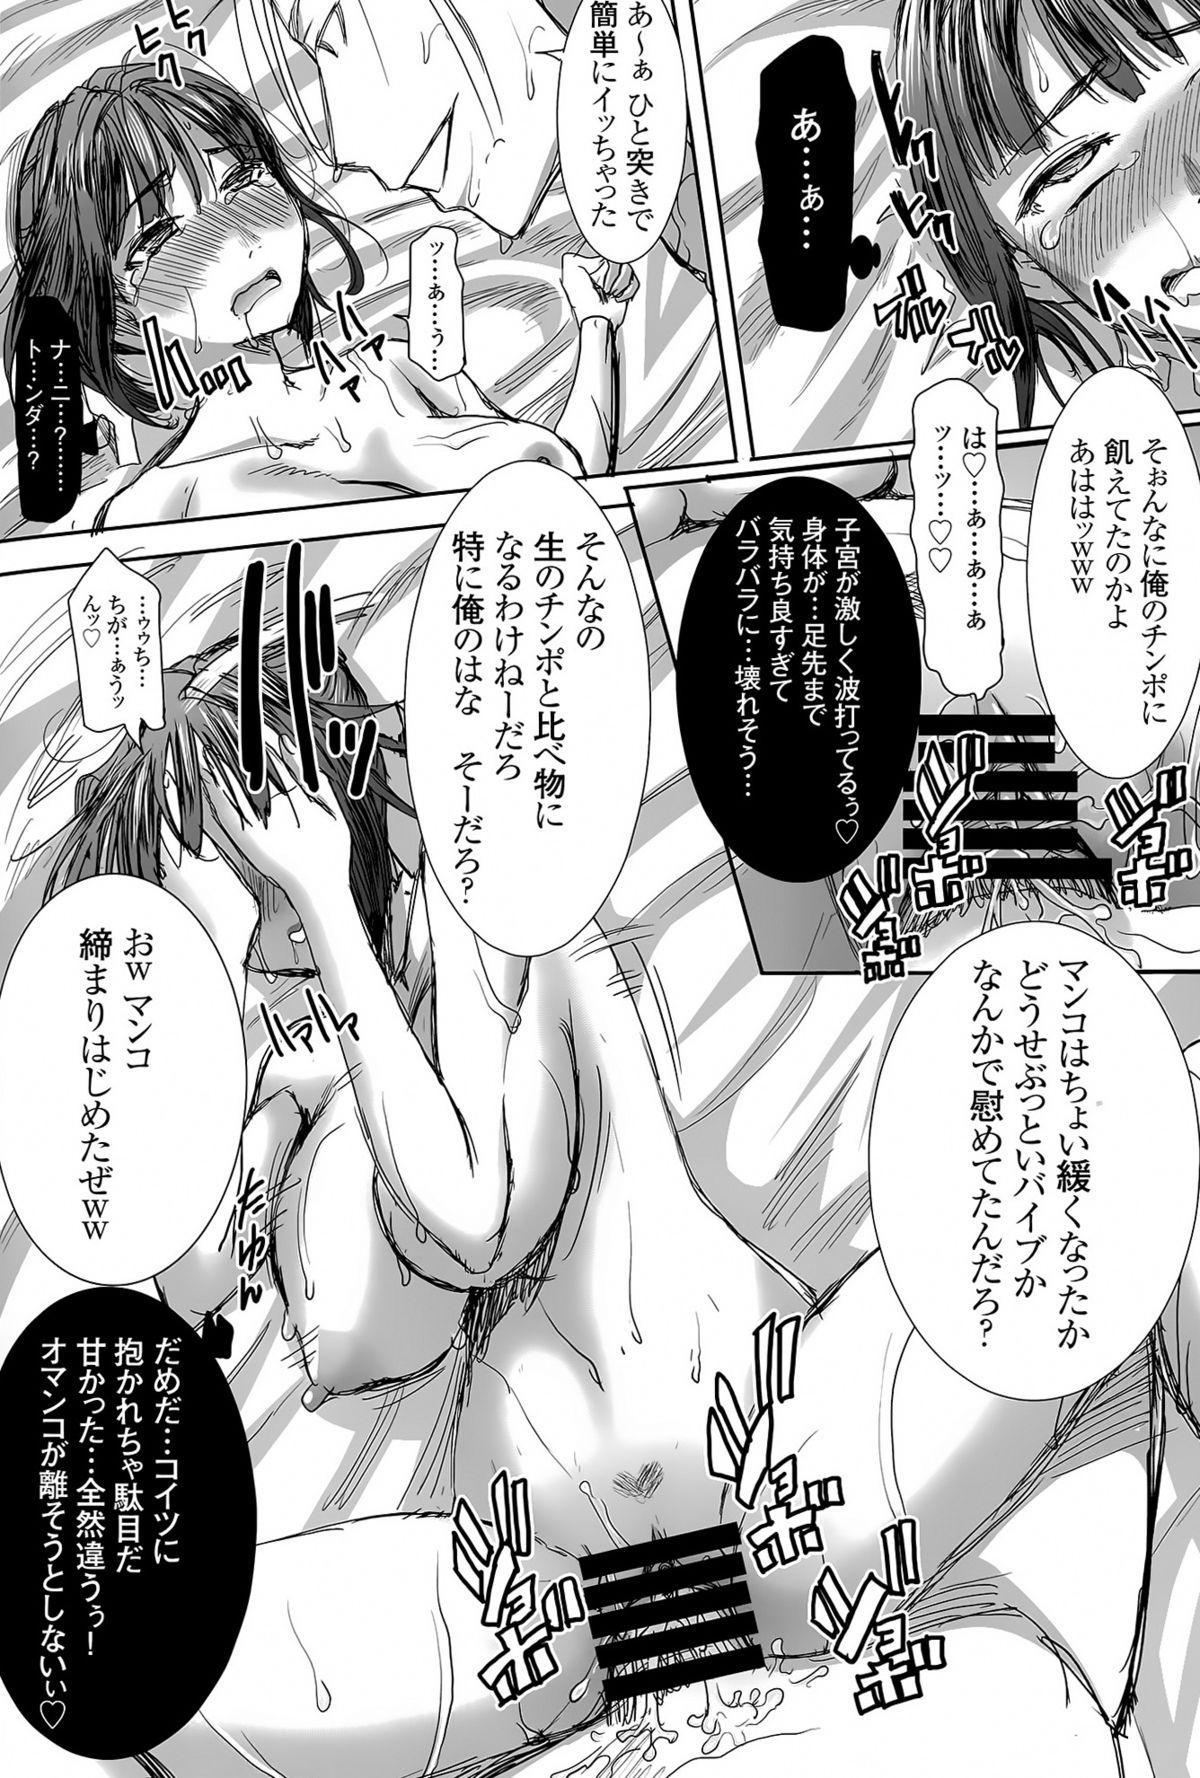 Unsweet Kurose Katsuko Plus Kakugo... 36